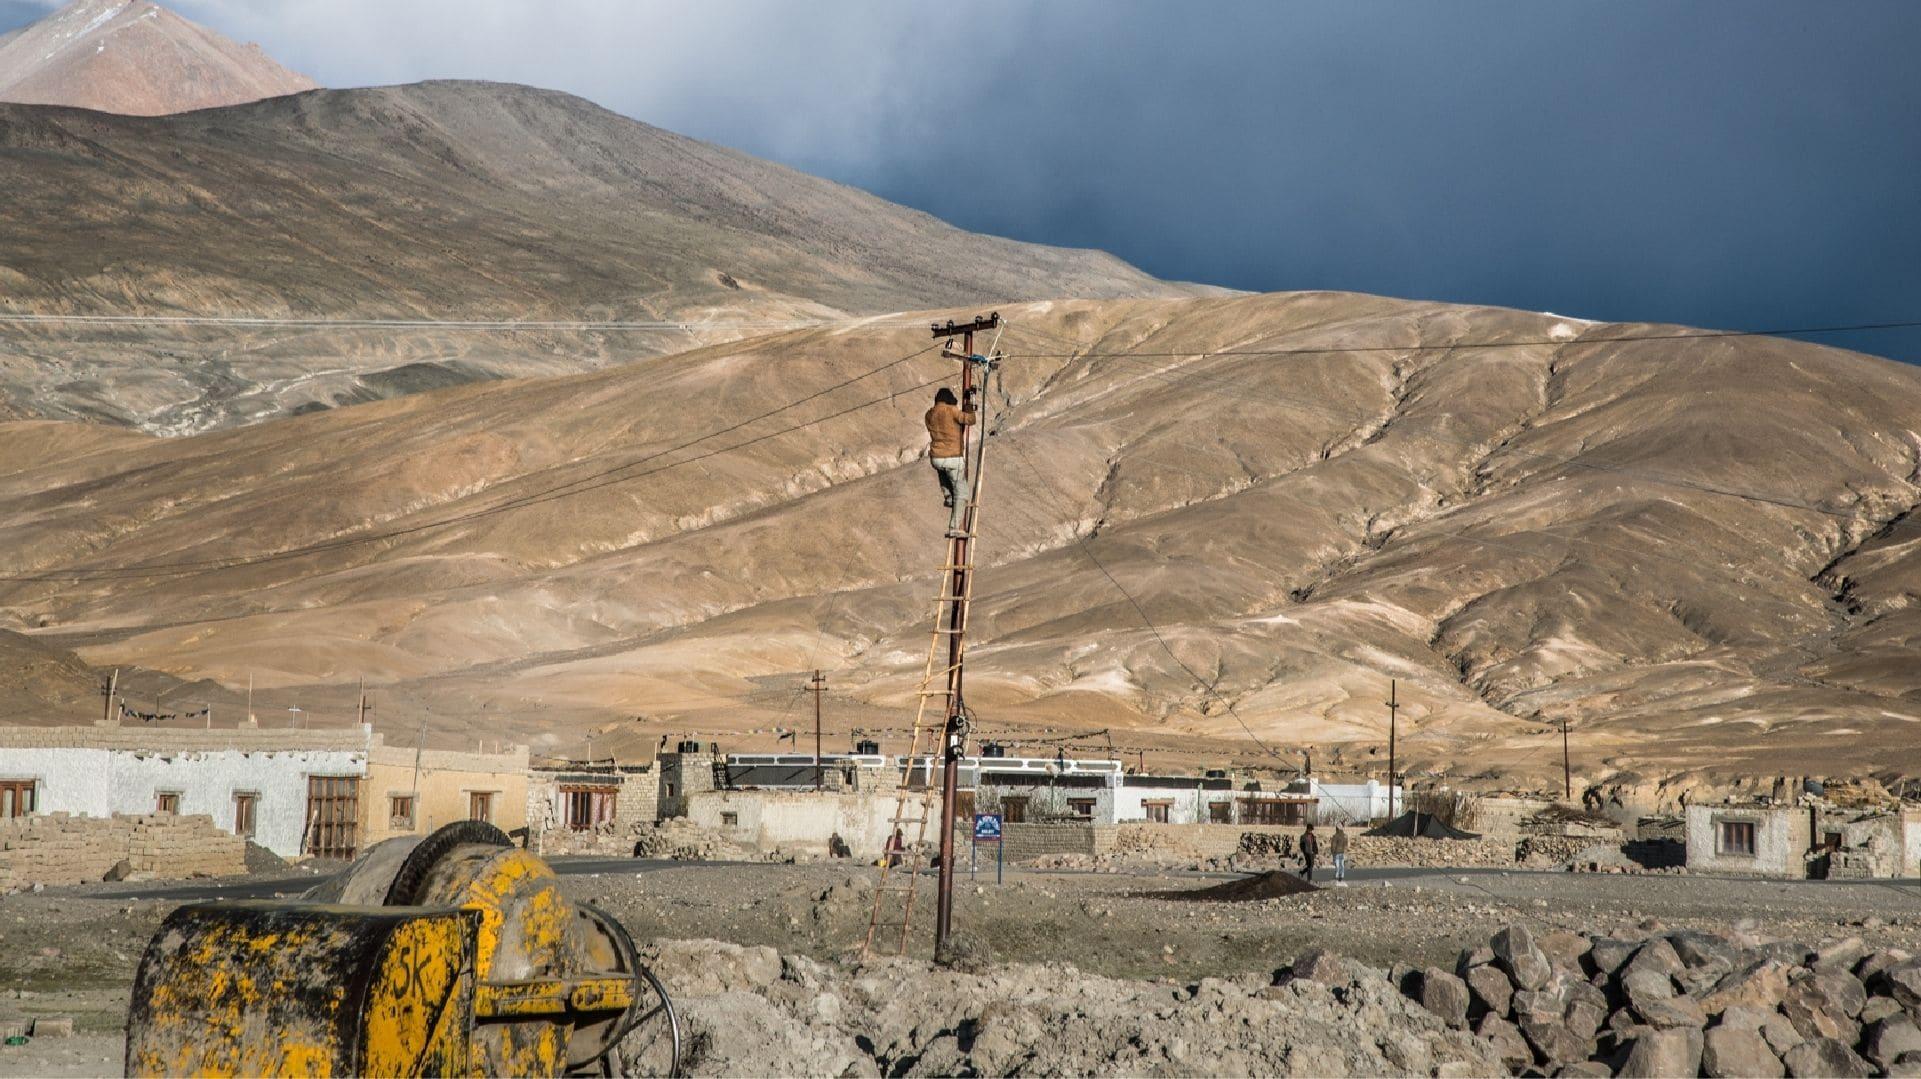 In Ladakh, vulnerable migrant workers face increasingly uncertain future as coronavirus outbreak unfolds